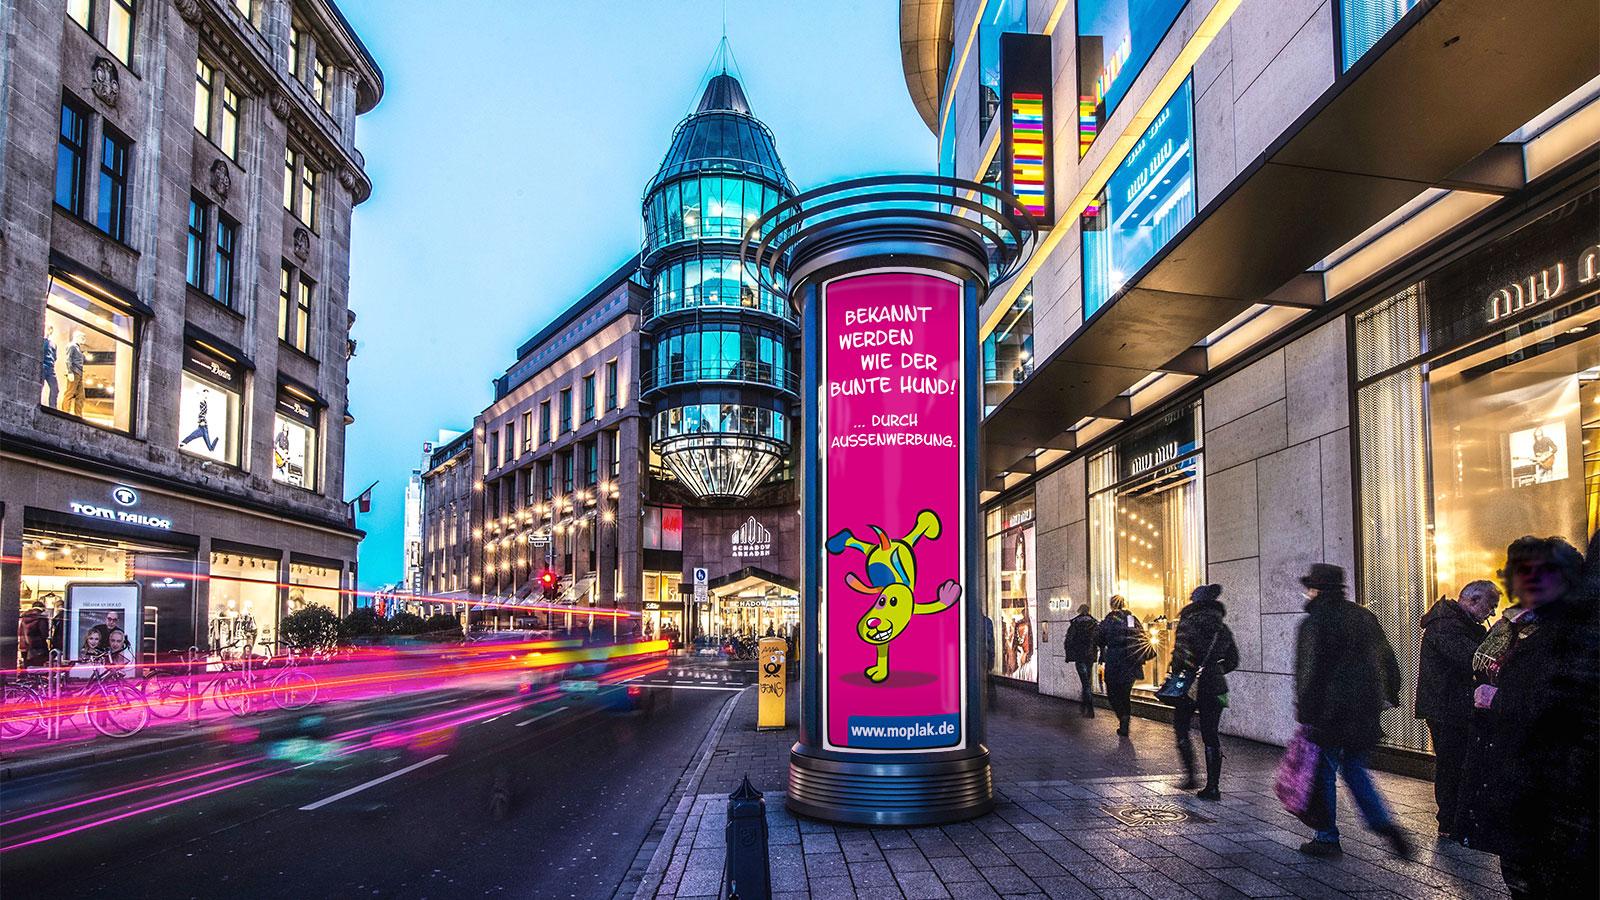 Ulm-Aussenwerbung-Litfasssaeule-Werbung